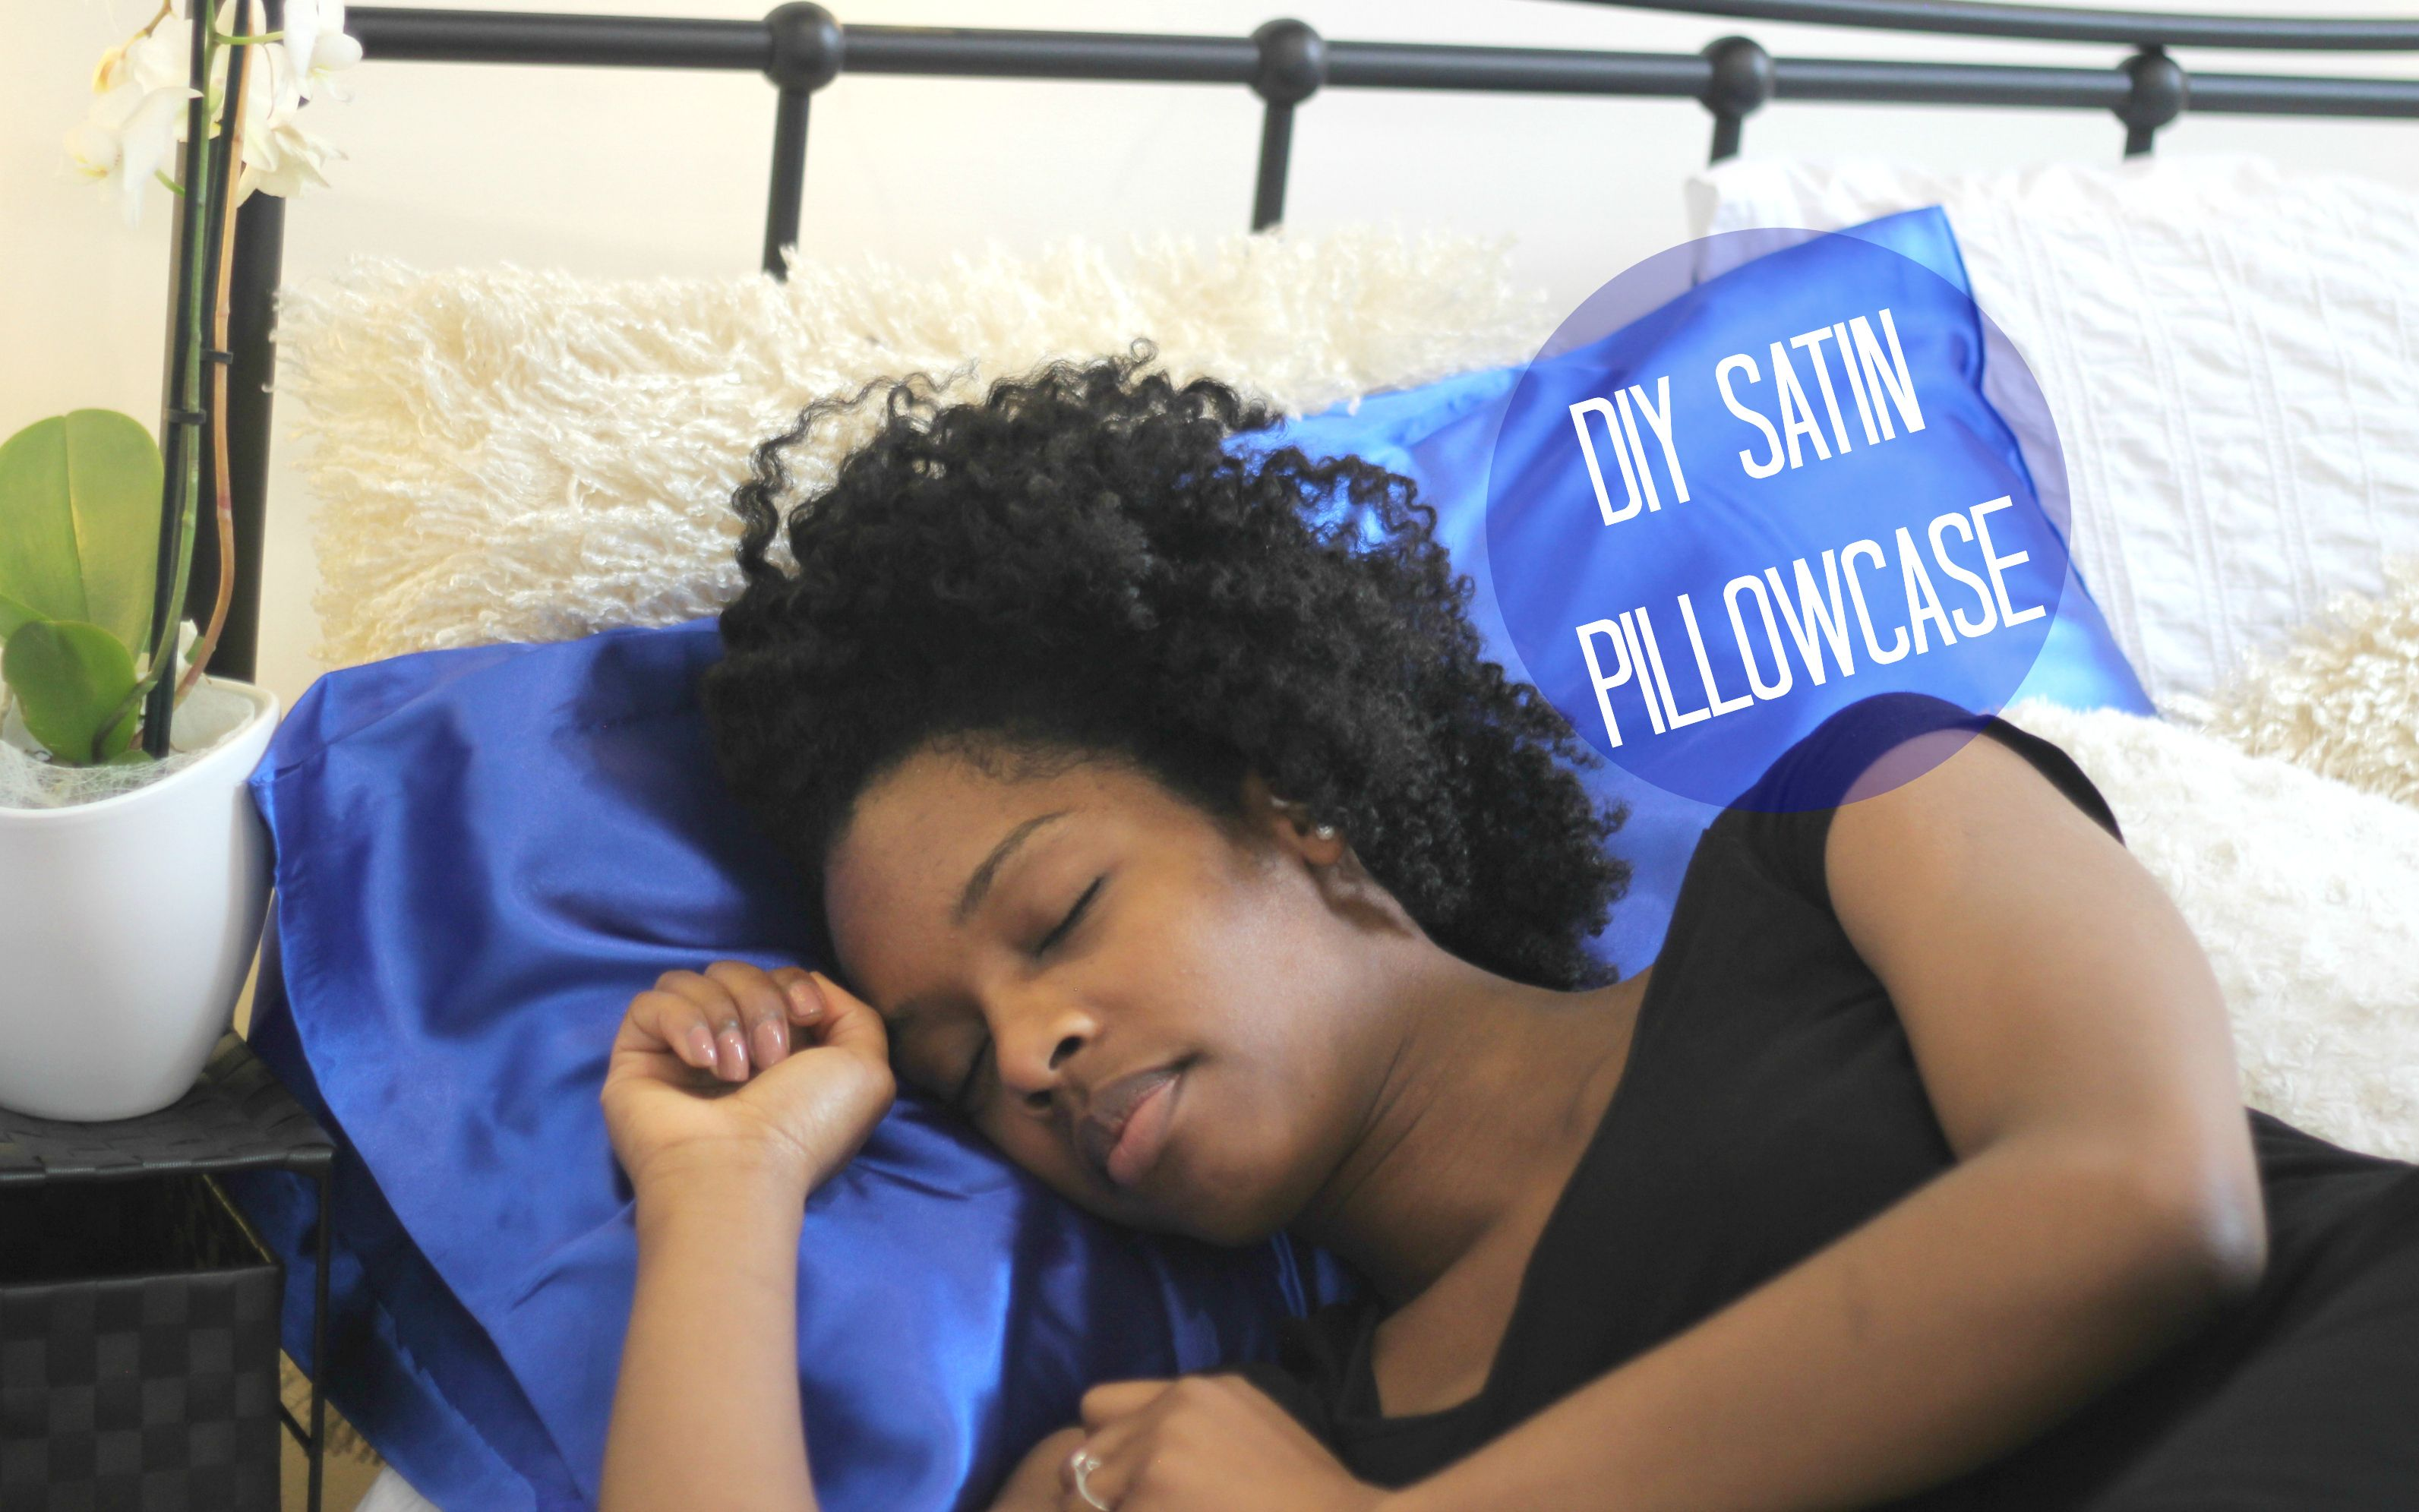 Diy Satin Pillowcase Satin Pillowcase Satin Hair Care